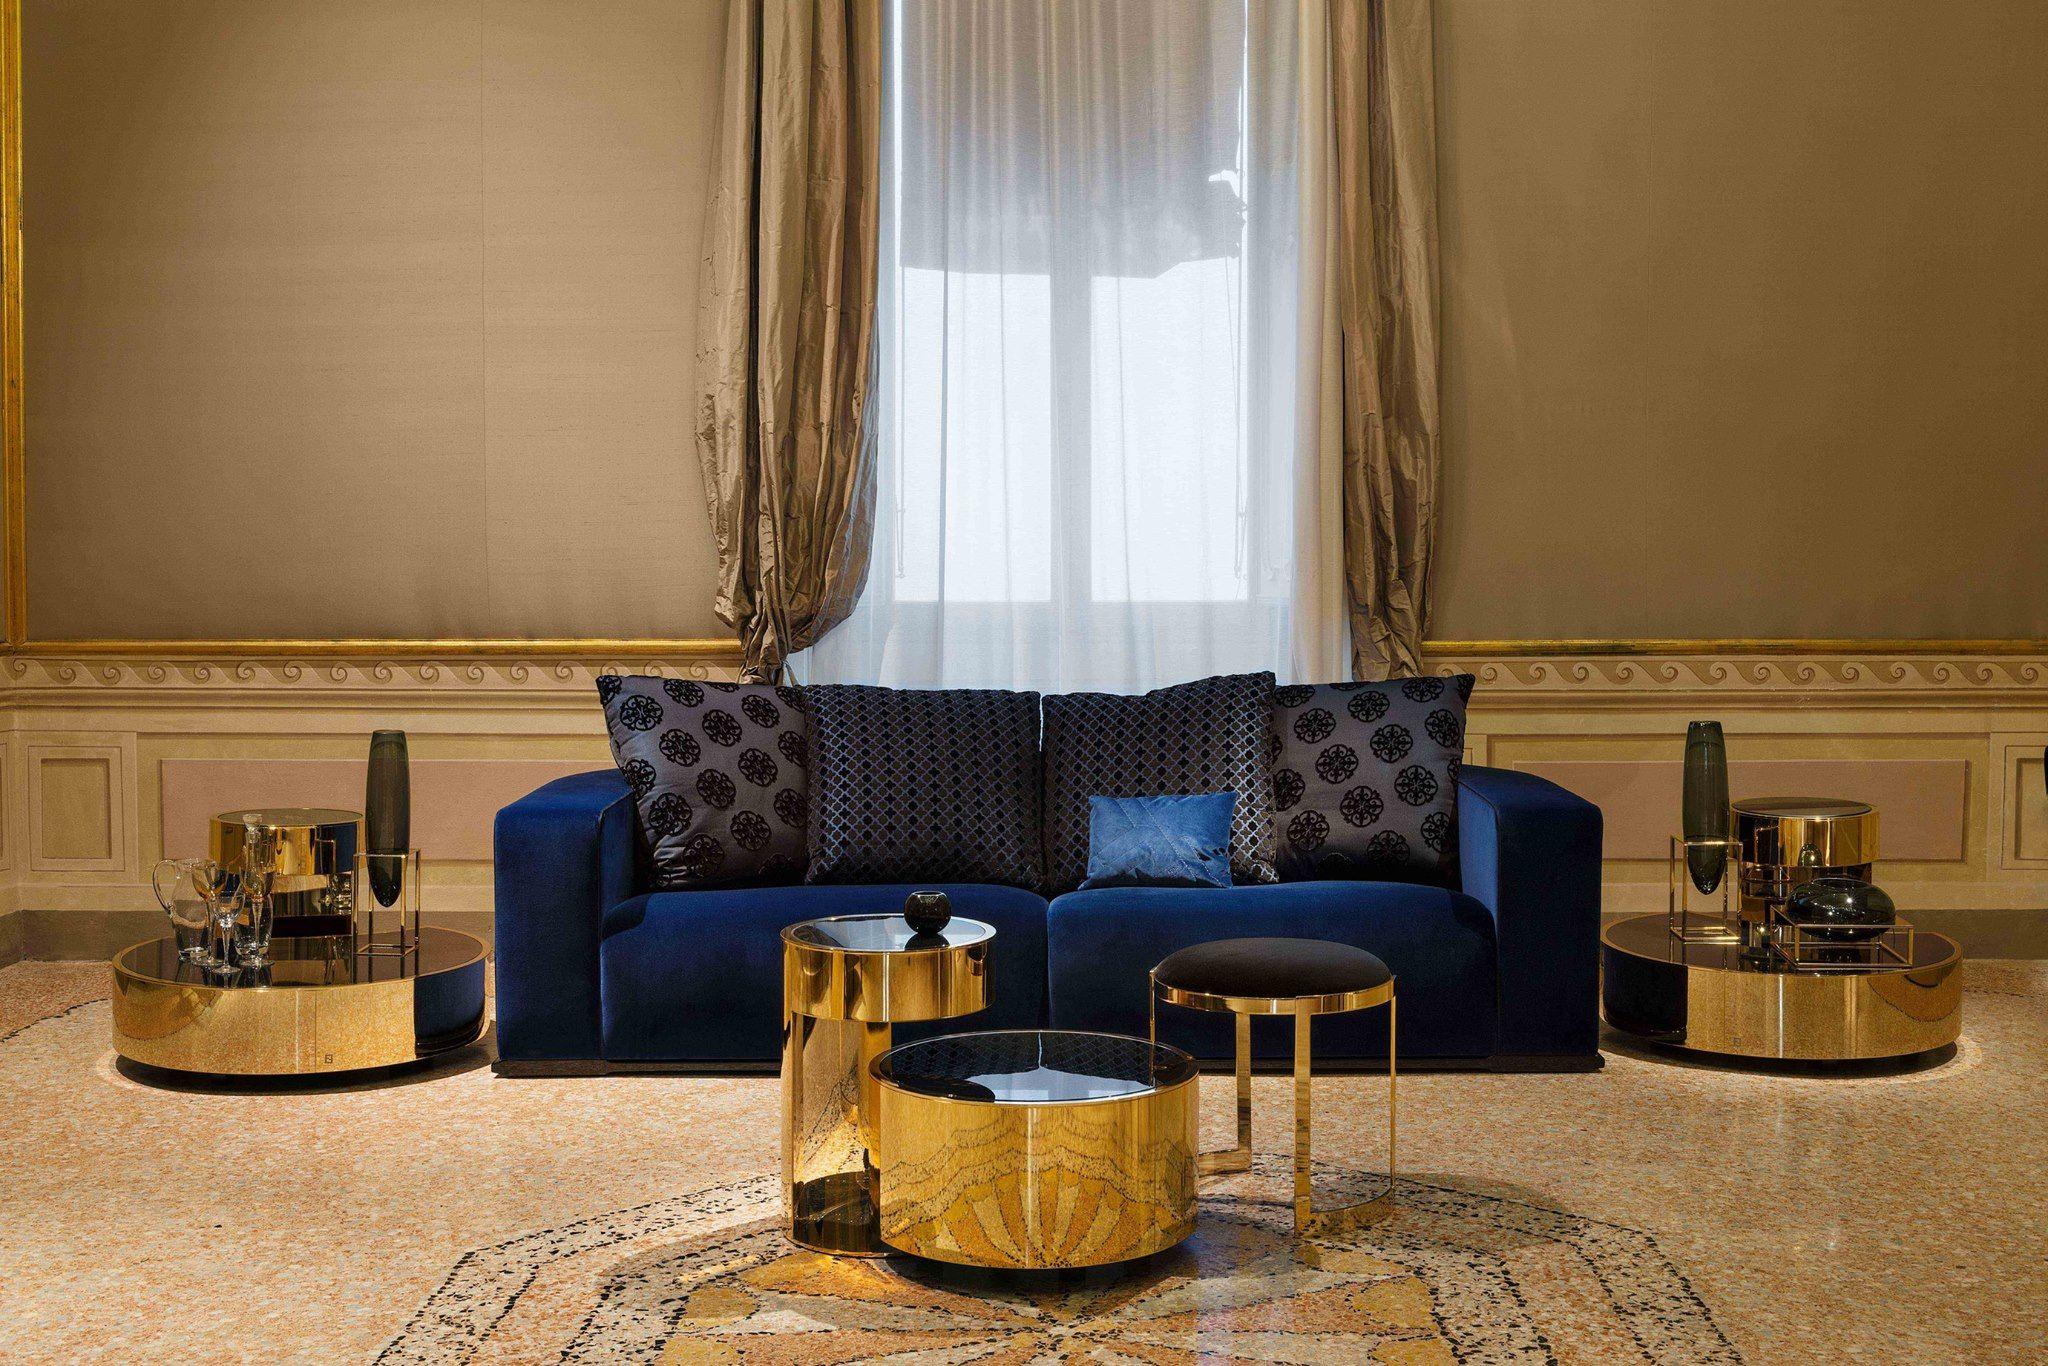 244affbbd036 FENDI CASA BY DMHOME Memoire 3 seater sofa Constellation tables Anya  ottoman FENDI CASA by DMHOME